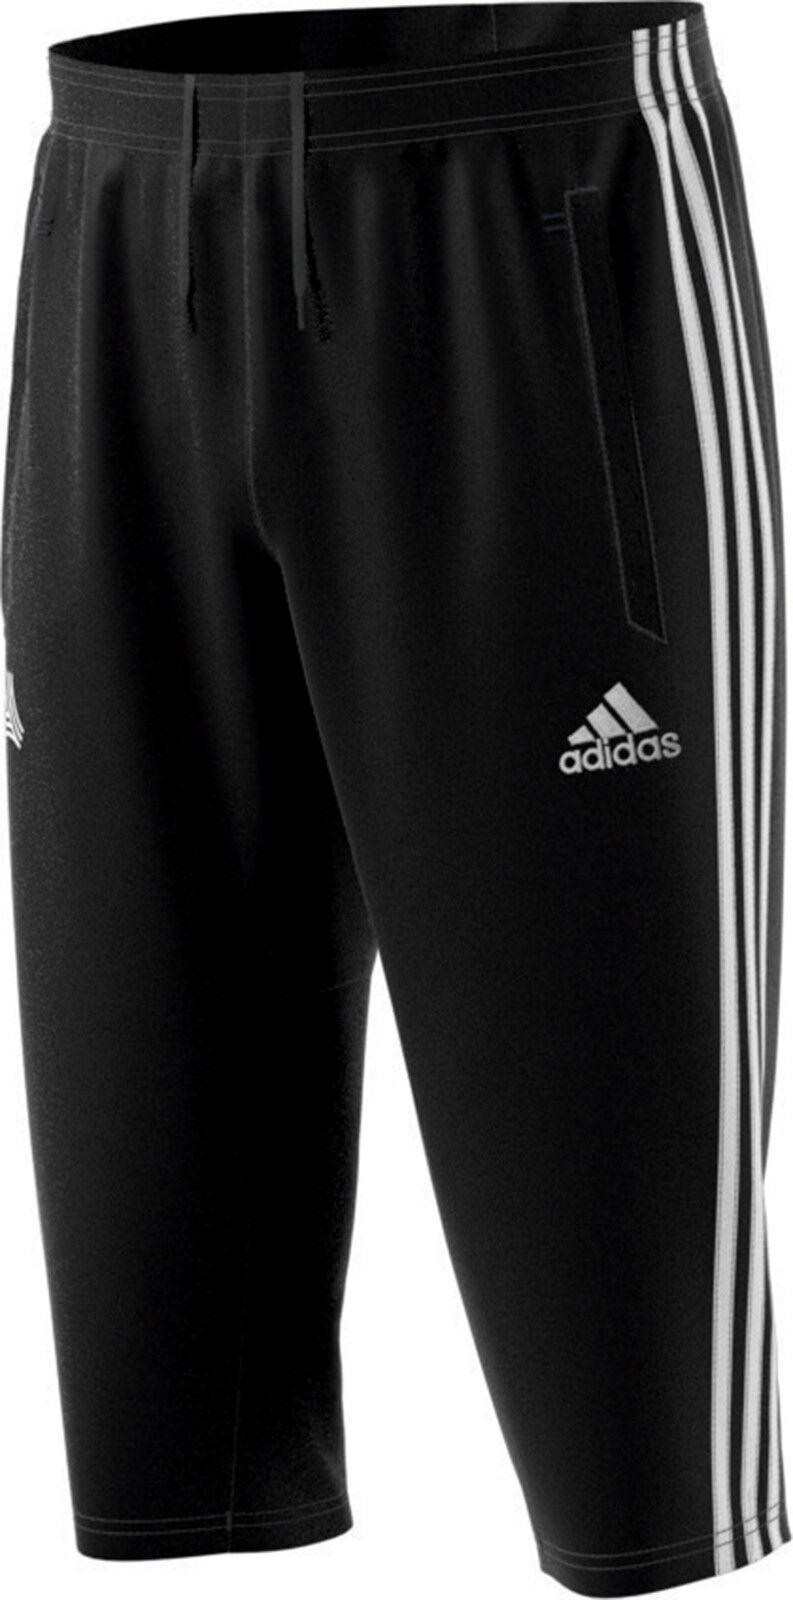 Adidas Performance Herren 3 4 4 4 Jogginghose TANC TRG 3 4 PN schwarz weiß (AZ6083) f72cb7